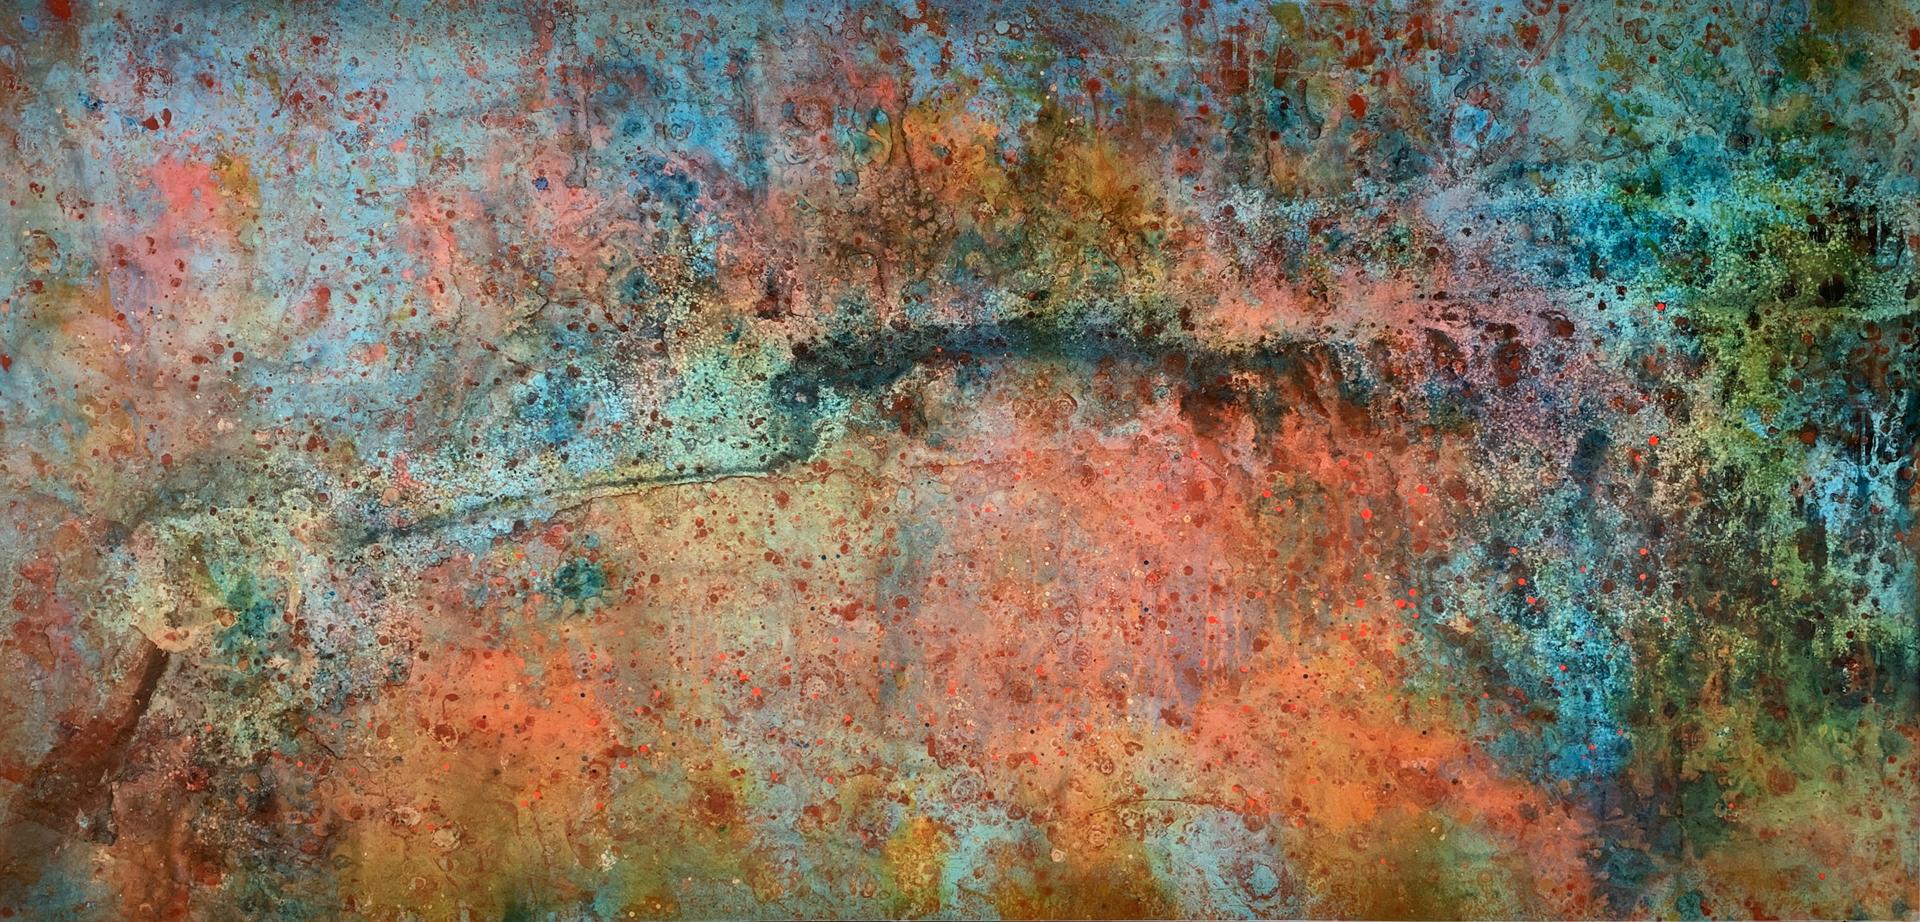 Life on Mars by Paul Tamanian